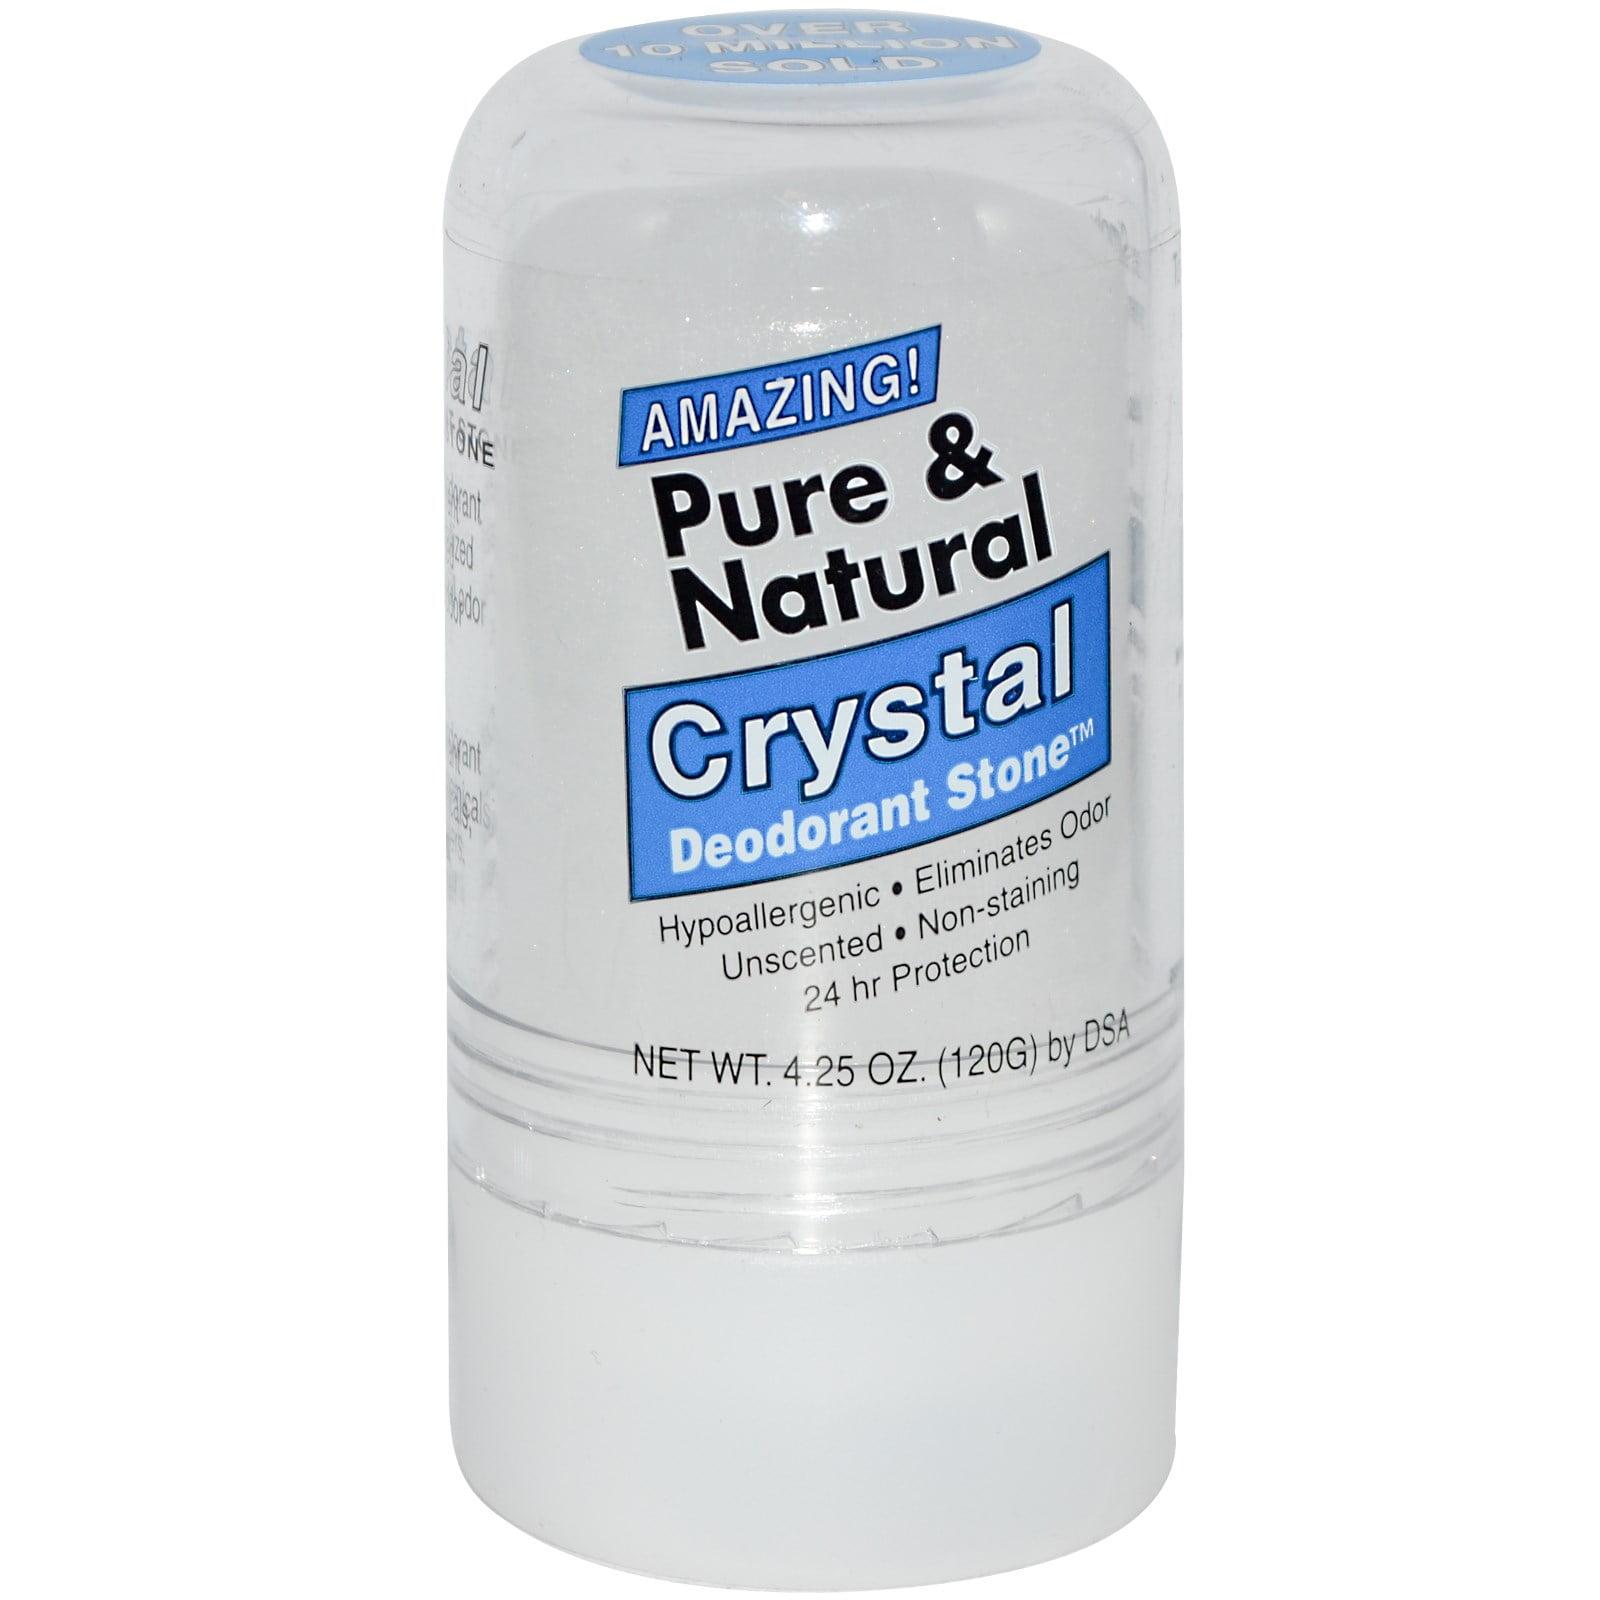 Mineral deodorant stone reviews